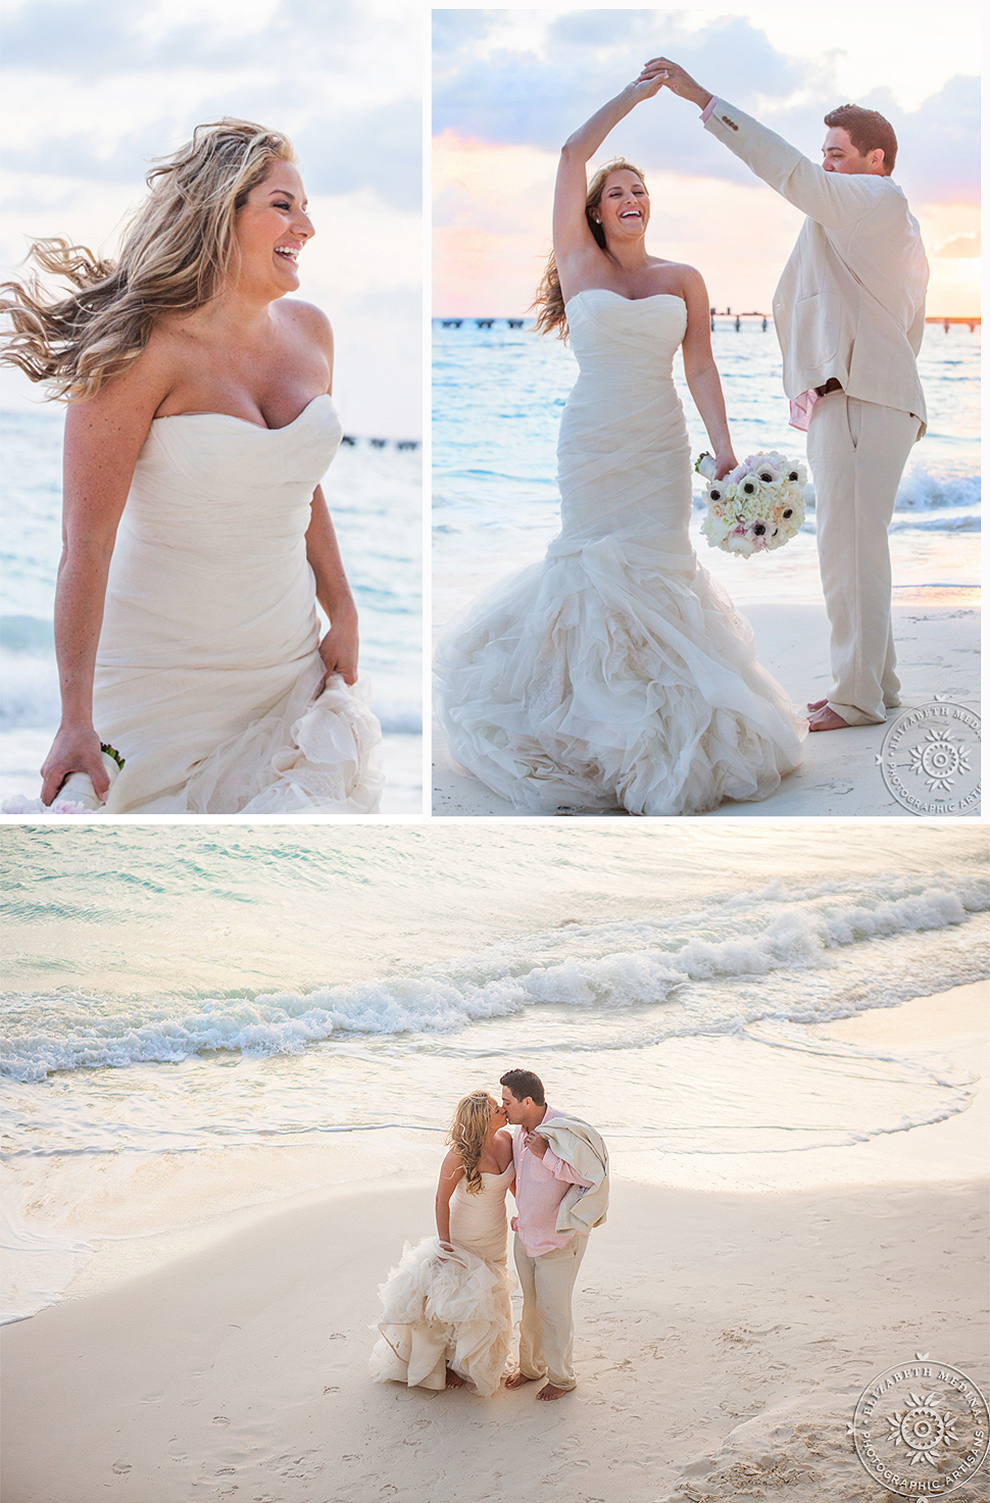 cancun_trash the dress photos elizabeth medina 006 Trash the Dress and Wedding Photography, Beach Palace Cancun Mexico